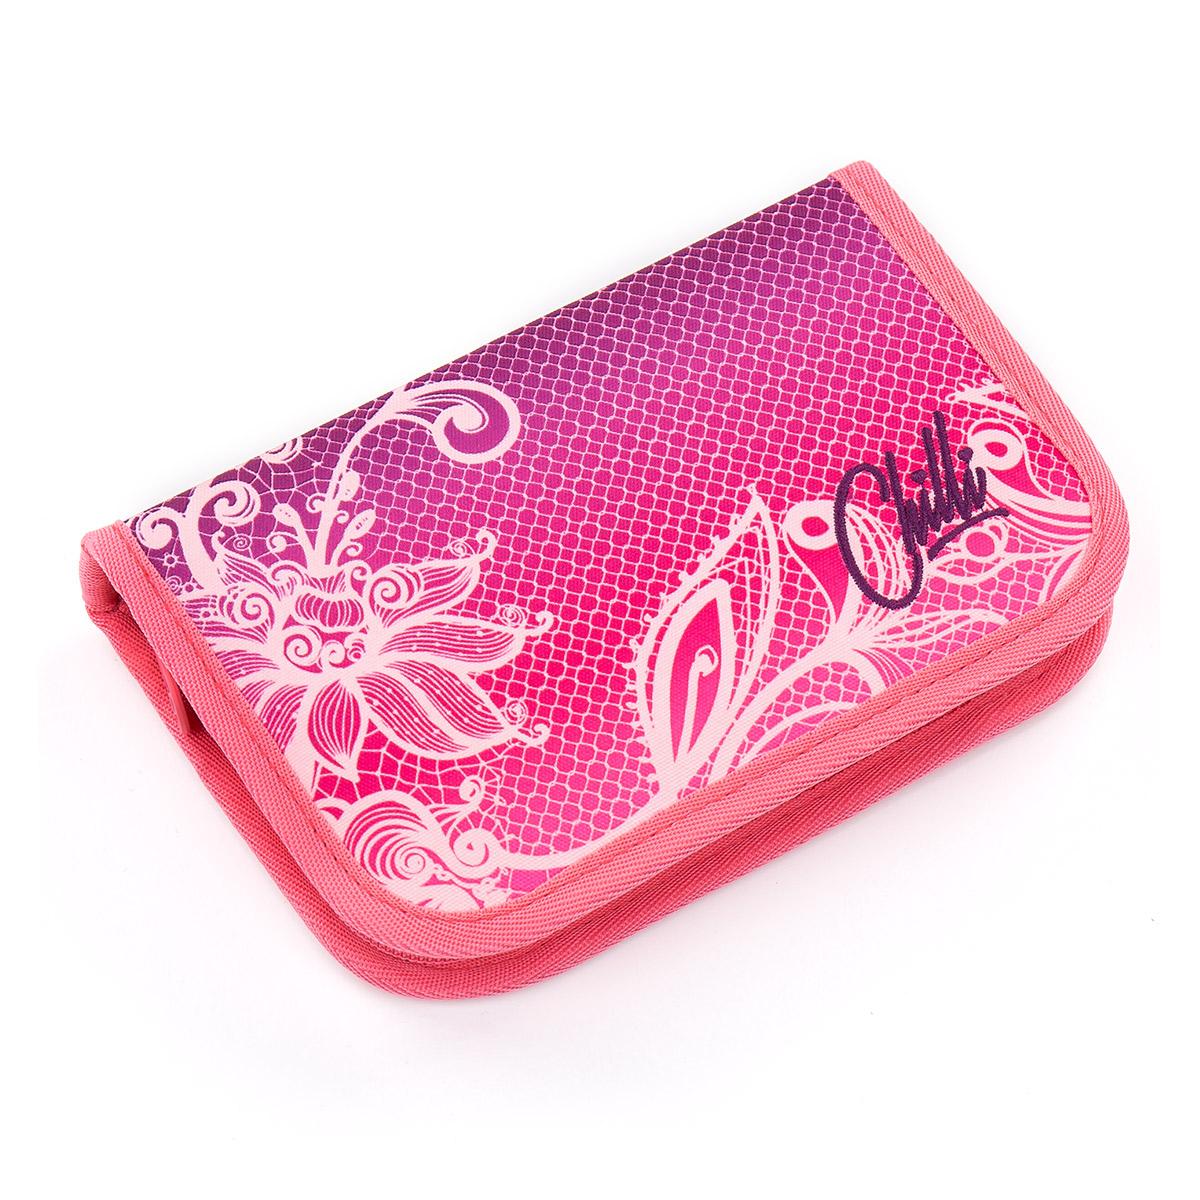 Topgal pouzdro CHI 864 H Pink